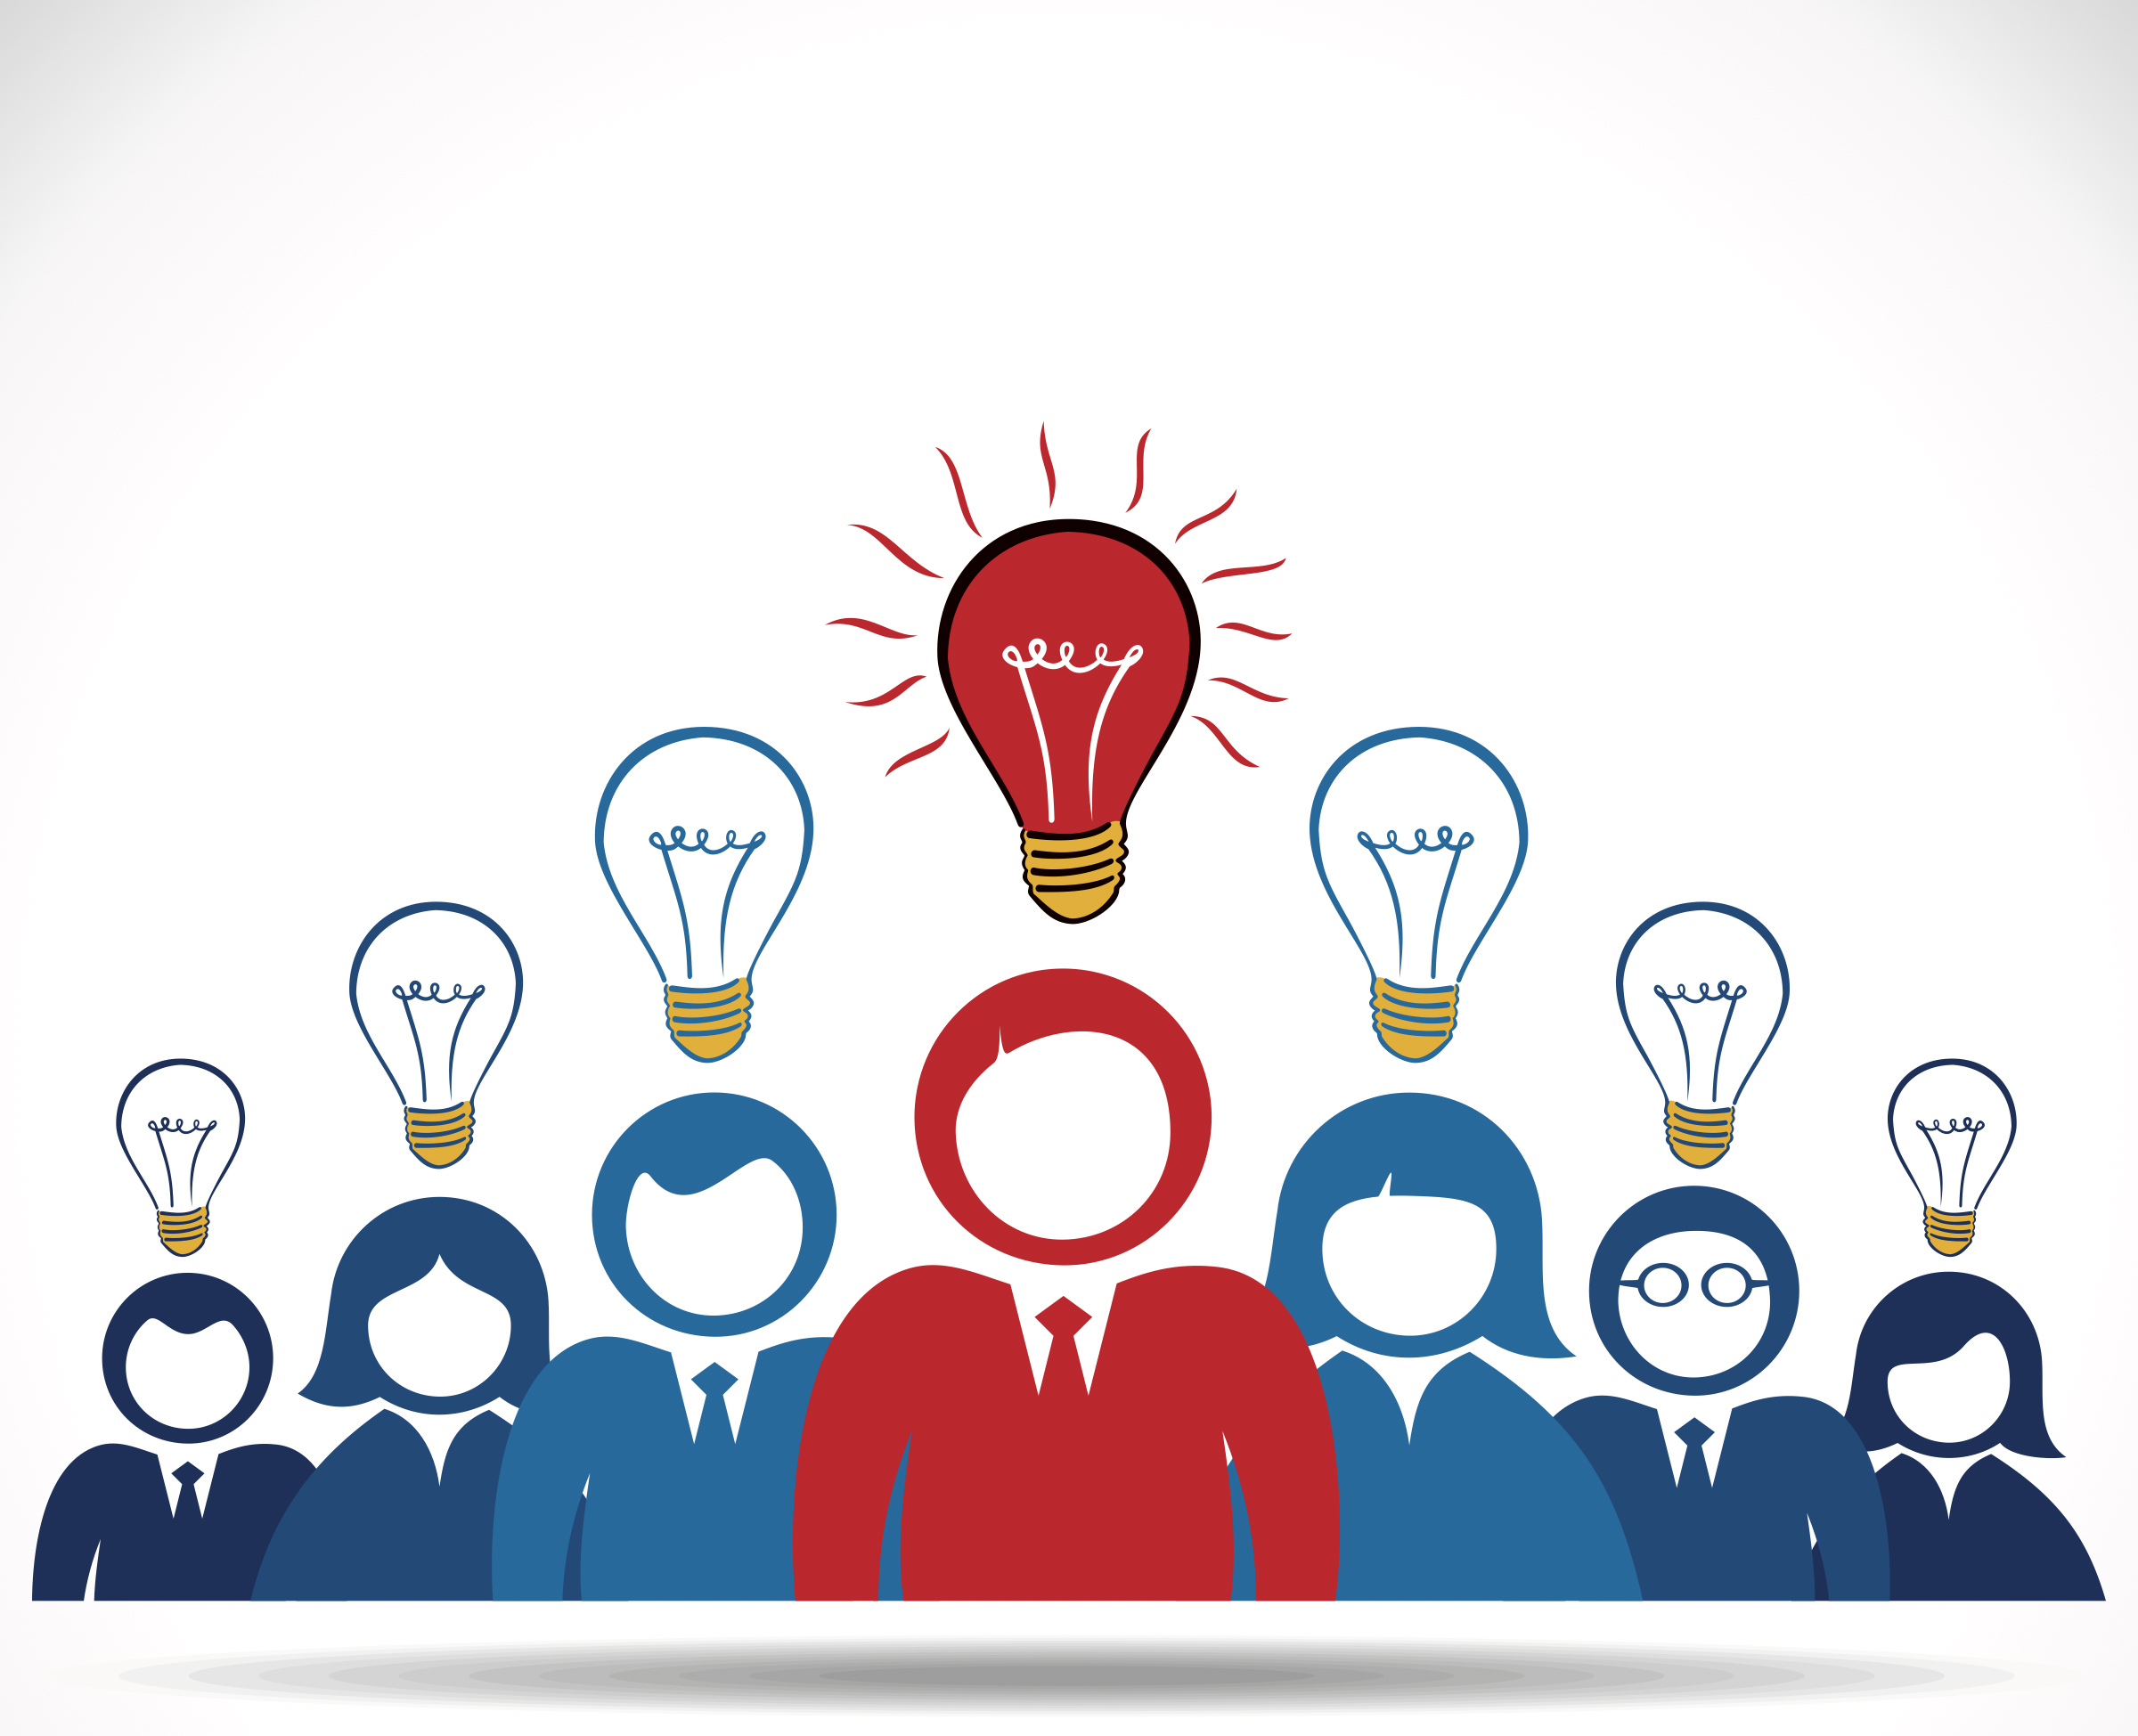 7-ventures-7-eleven-steps-into-venture-capital-business